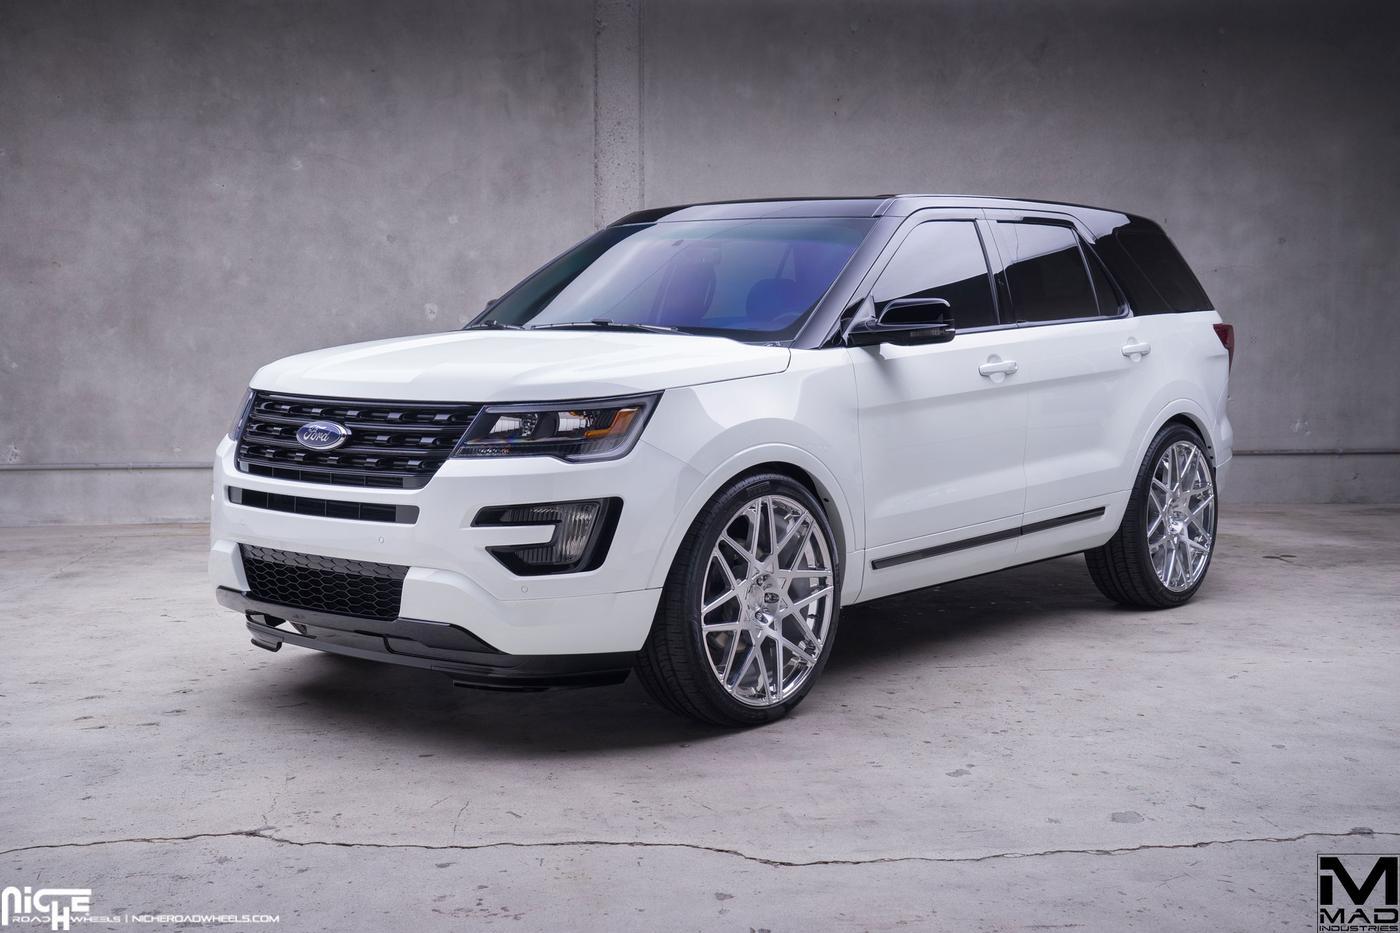 Ford Explorer Black Rims >> 2016 Ford Explorer Mad Industries Niche Alpine Mht